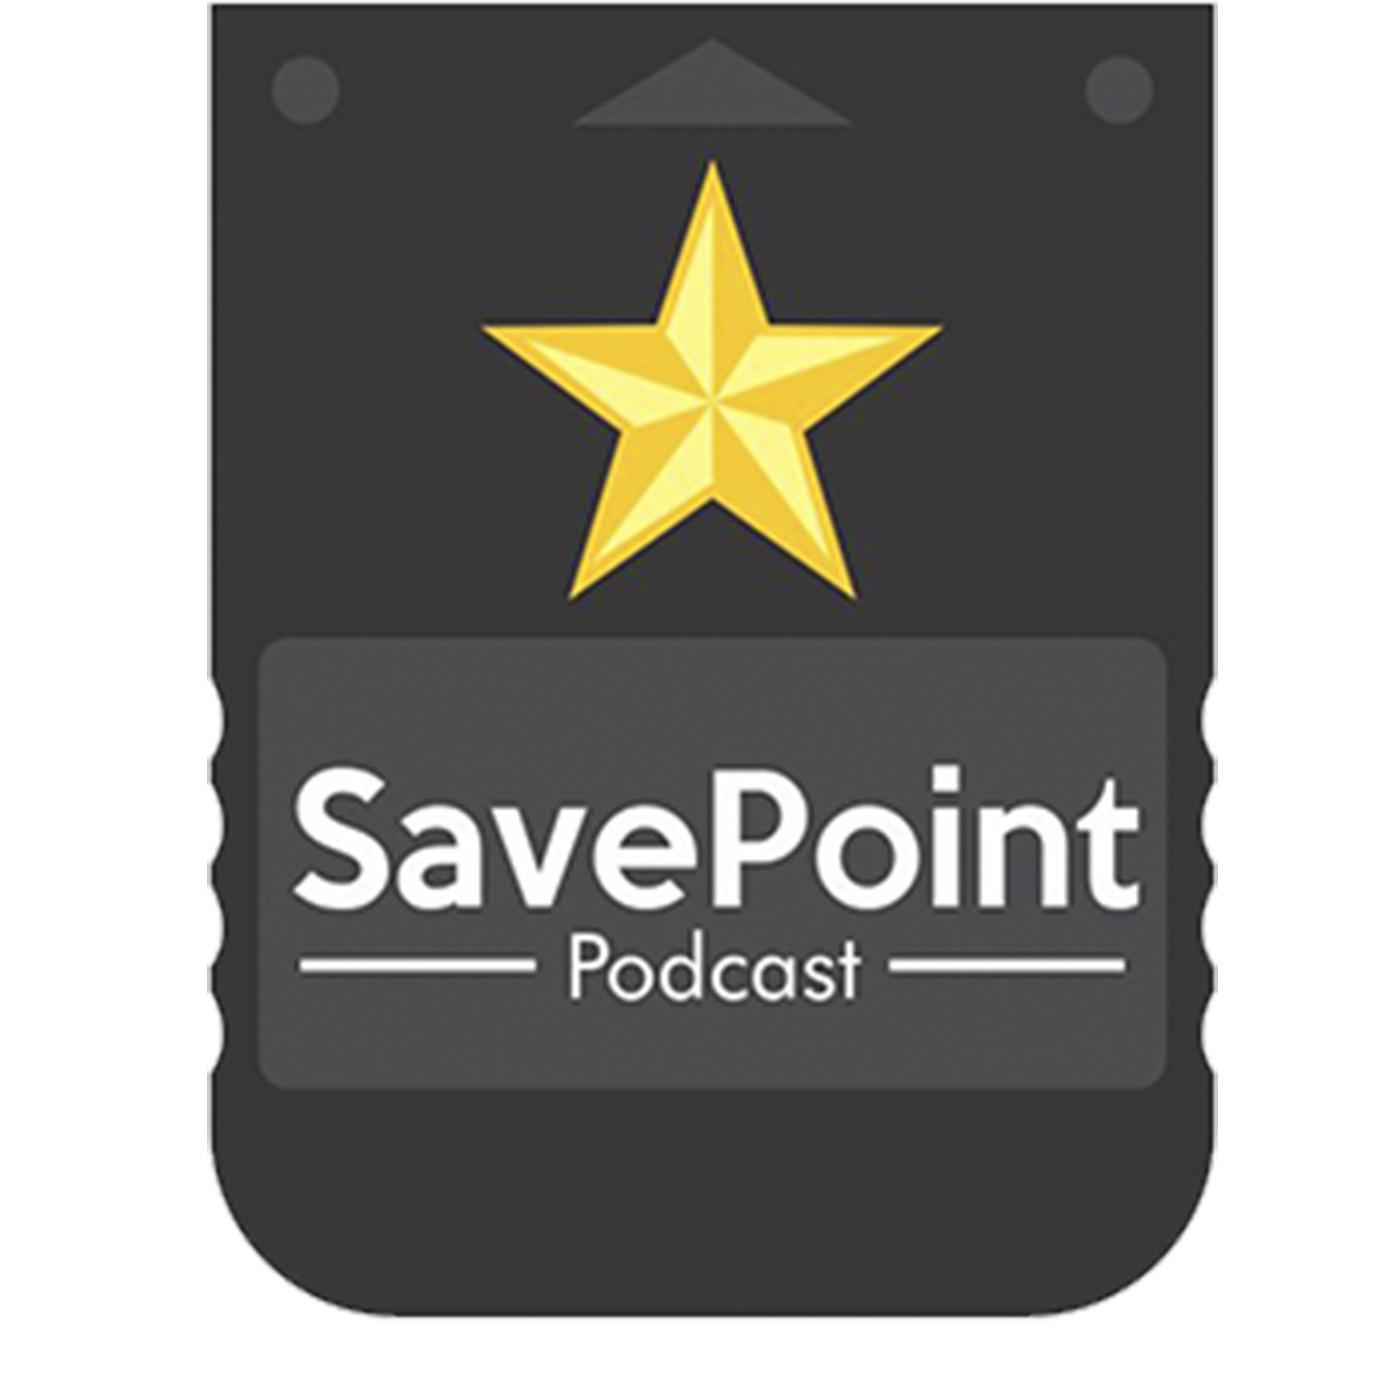 Savepoint Podcast